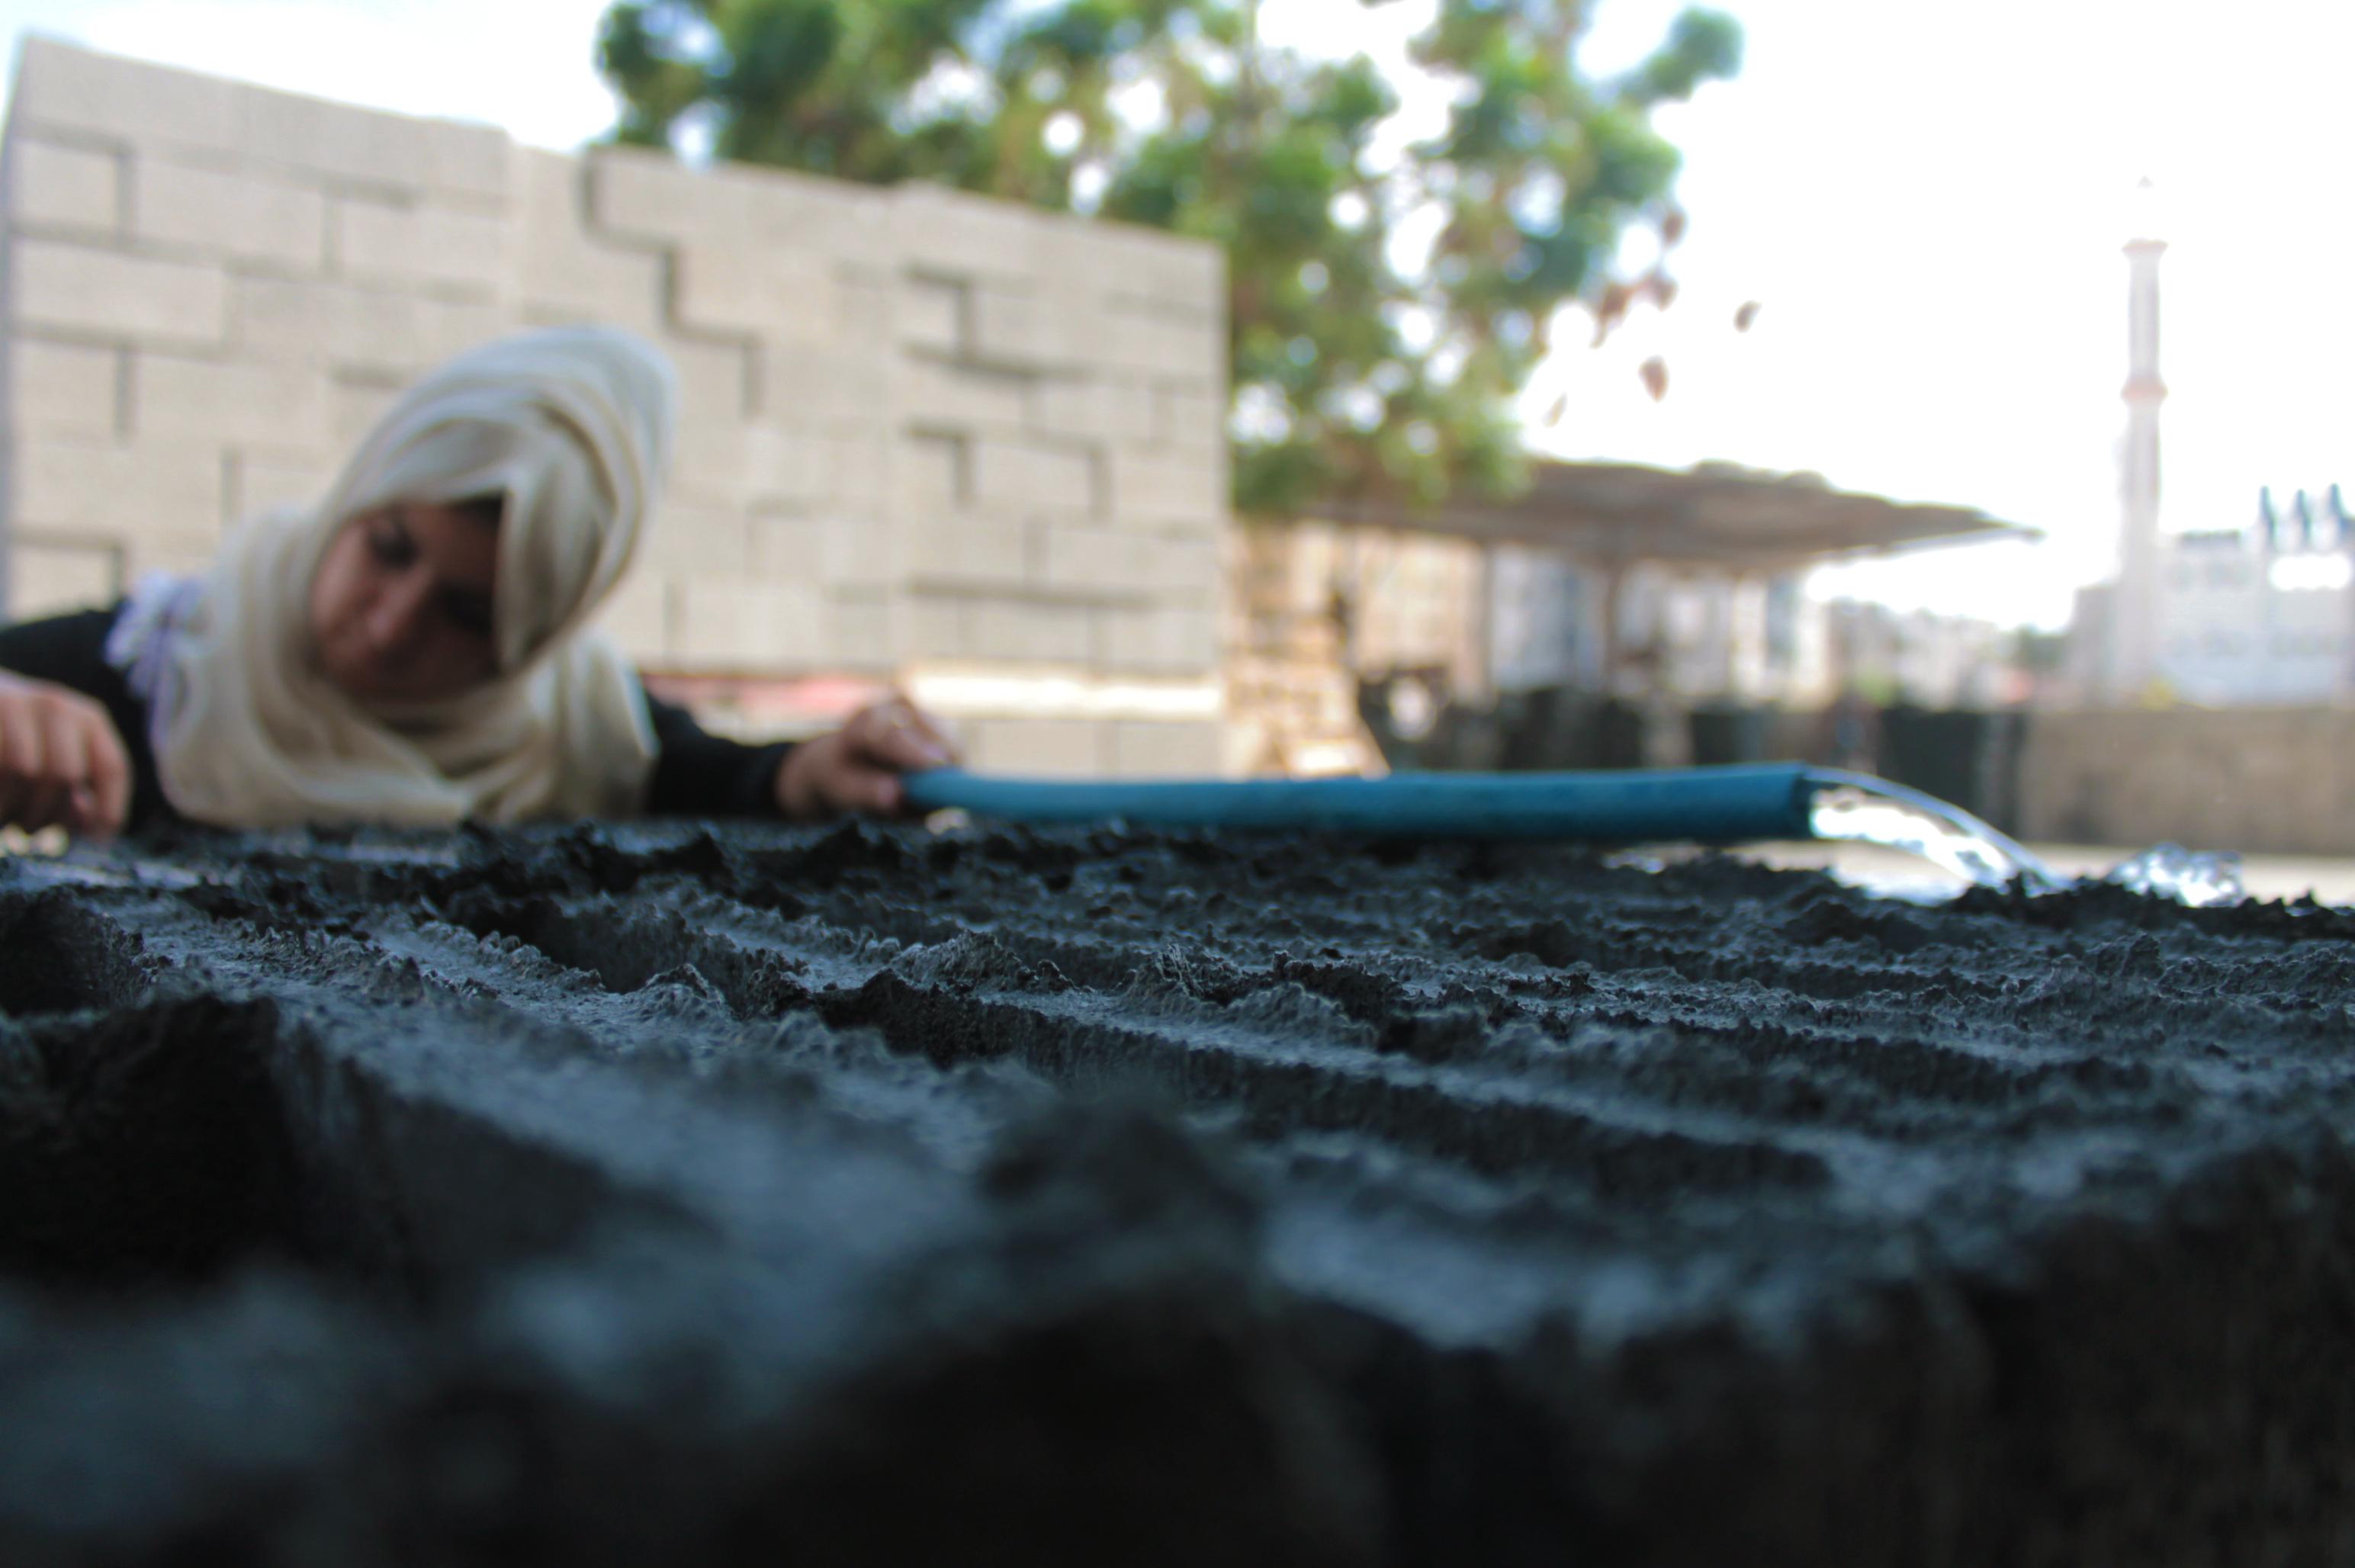 Majd Mashharawi and Rawan Abdelatif, two 23 year old civil engineers living in Gaza, have invented the GreenCake building block. Photo: Asmaa Elkhaldi/The Turban Times